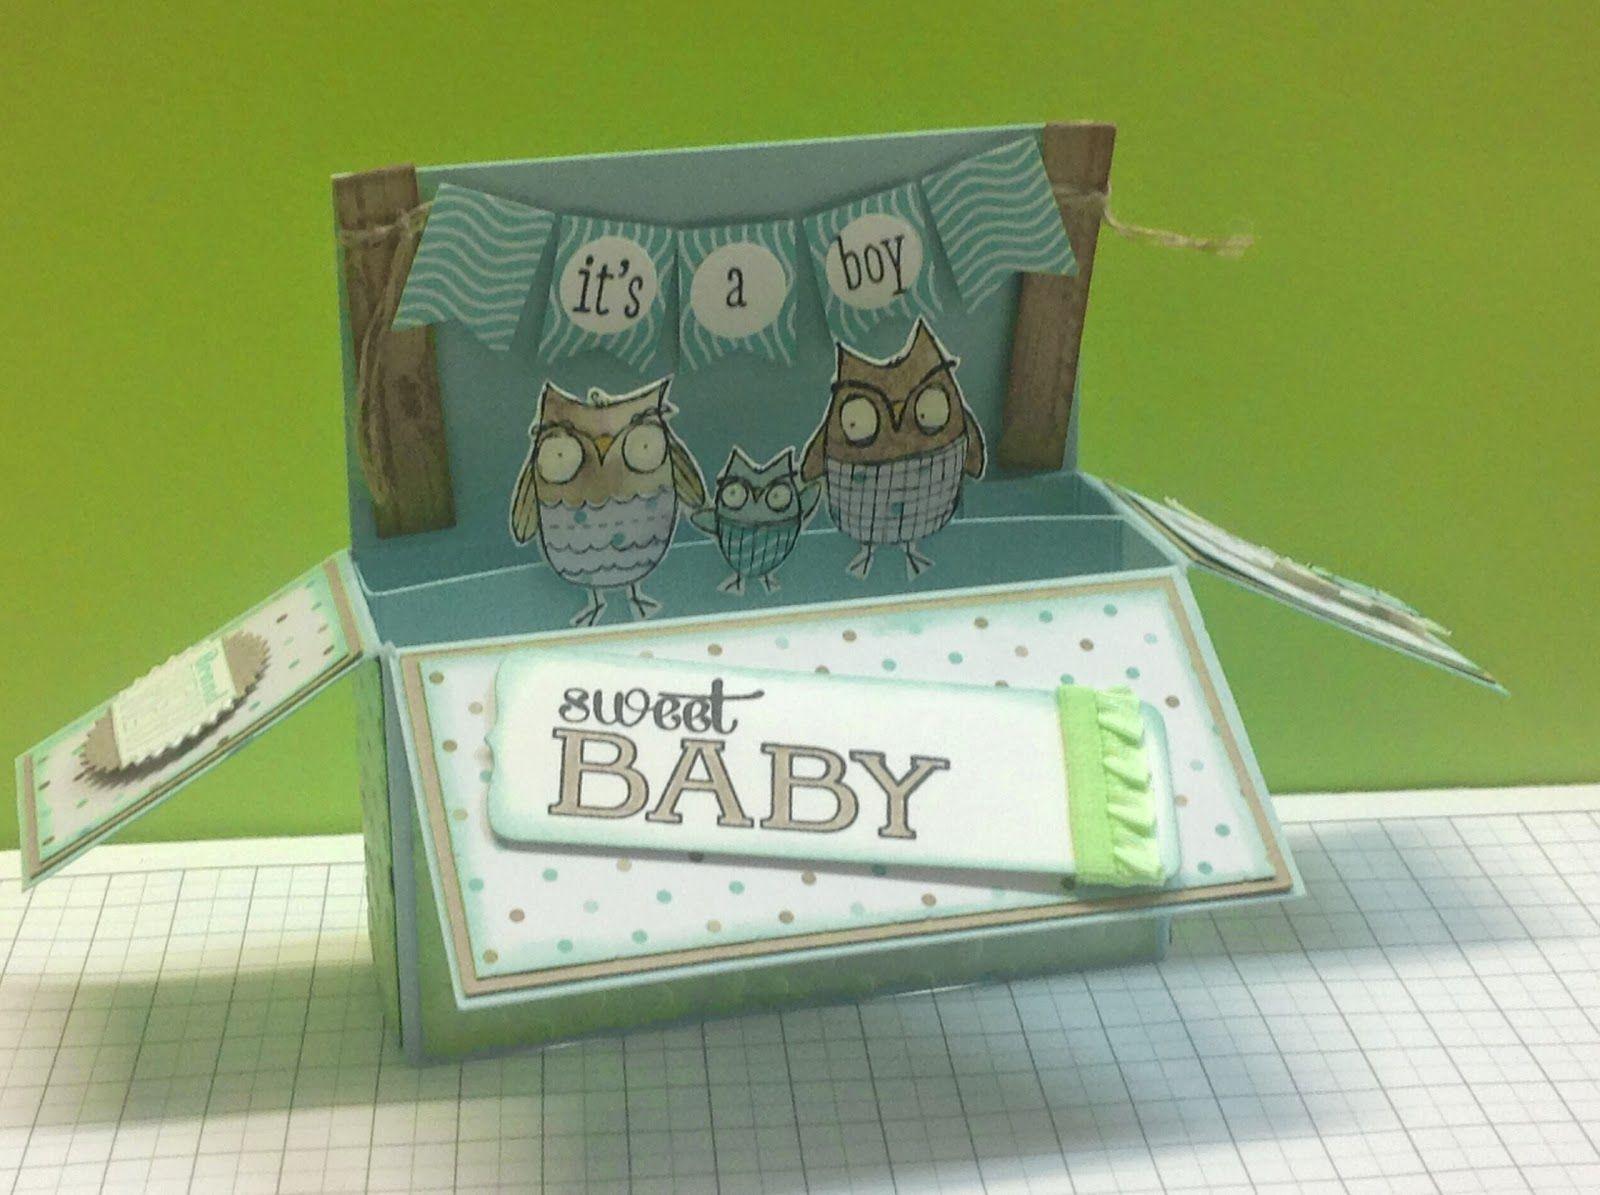 Sharyn's Inspirational Cards